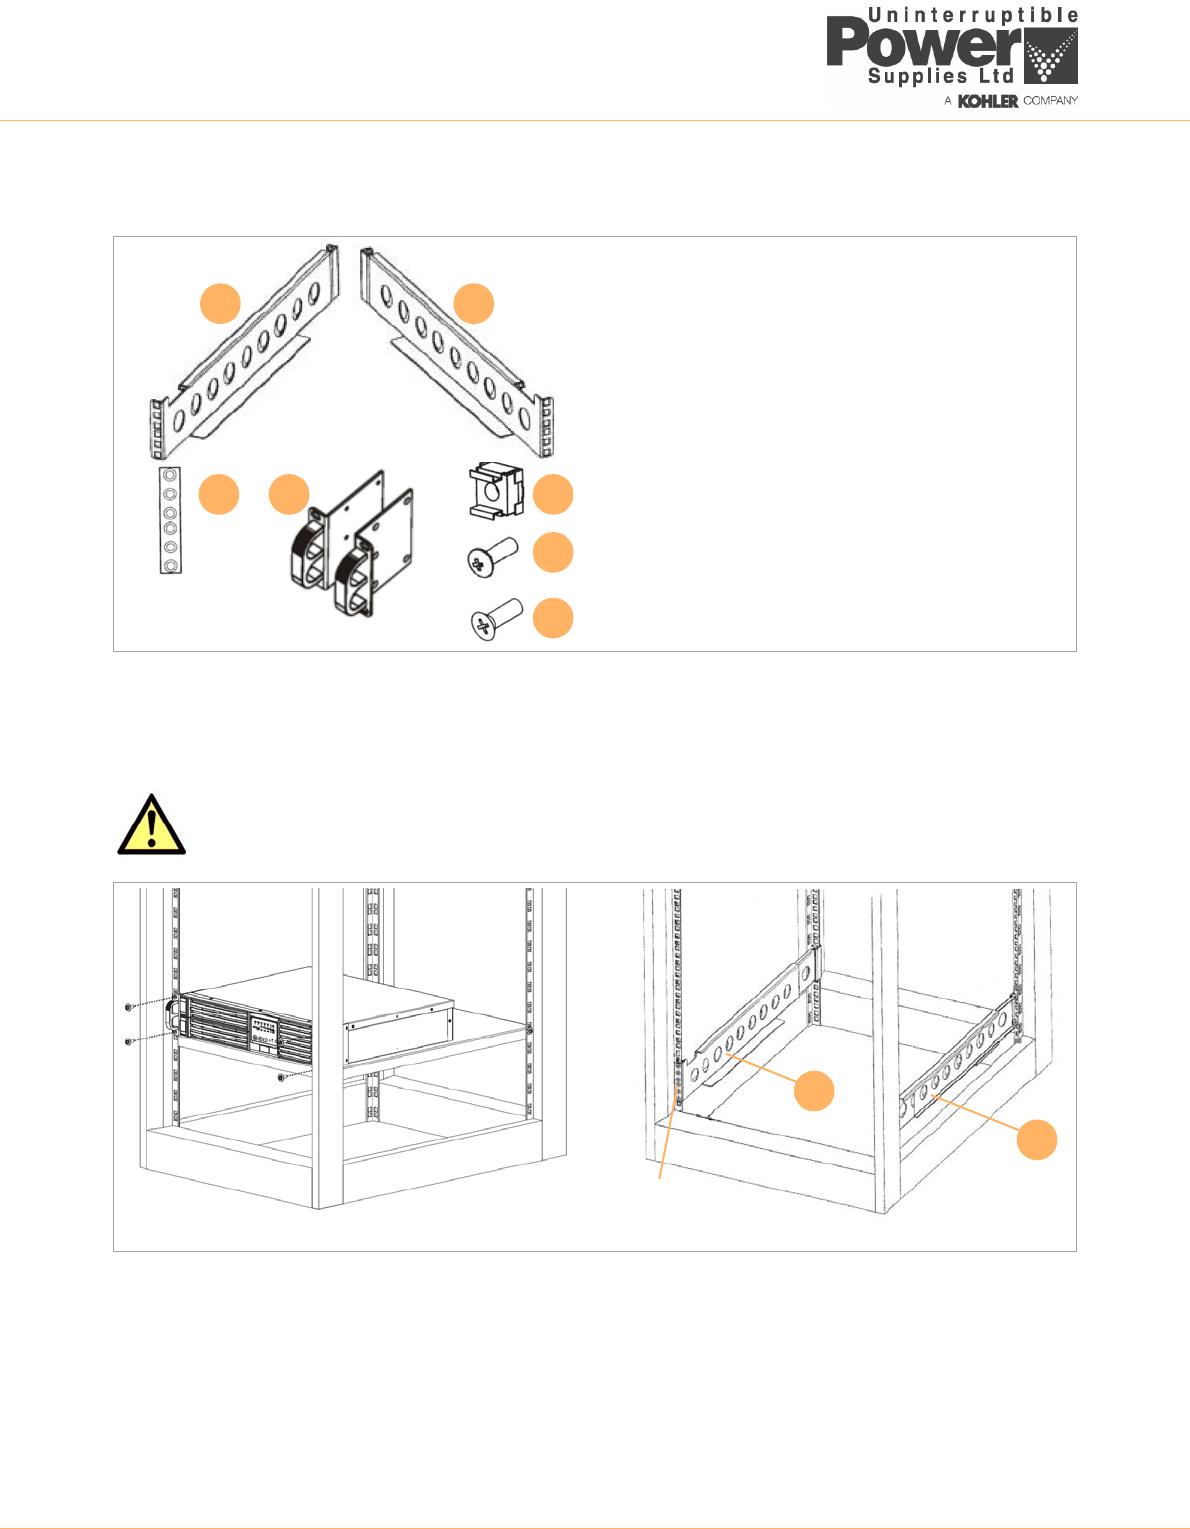 725 02 Pw1000 45 10 Kva User Manual Uk Ups K Va 12vdc To 220vac Inverter With Sine Wave Outputcircuit Diagram World 3 Installation And Set Up